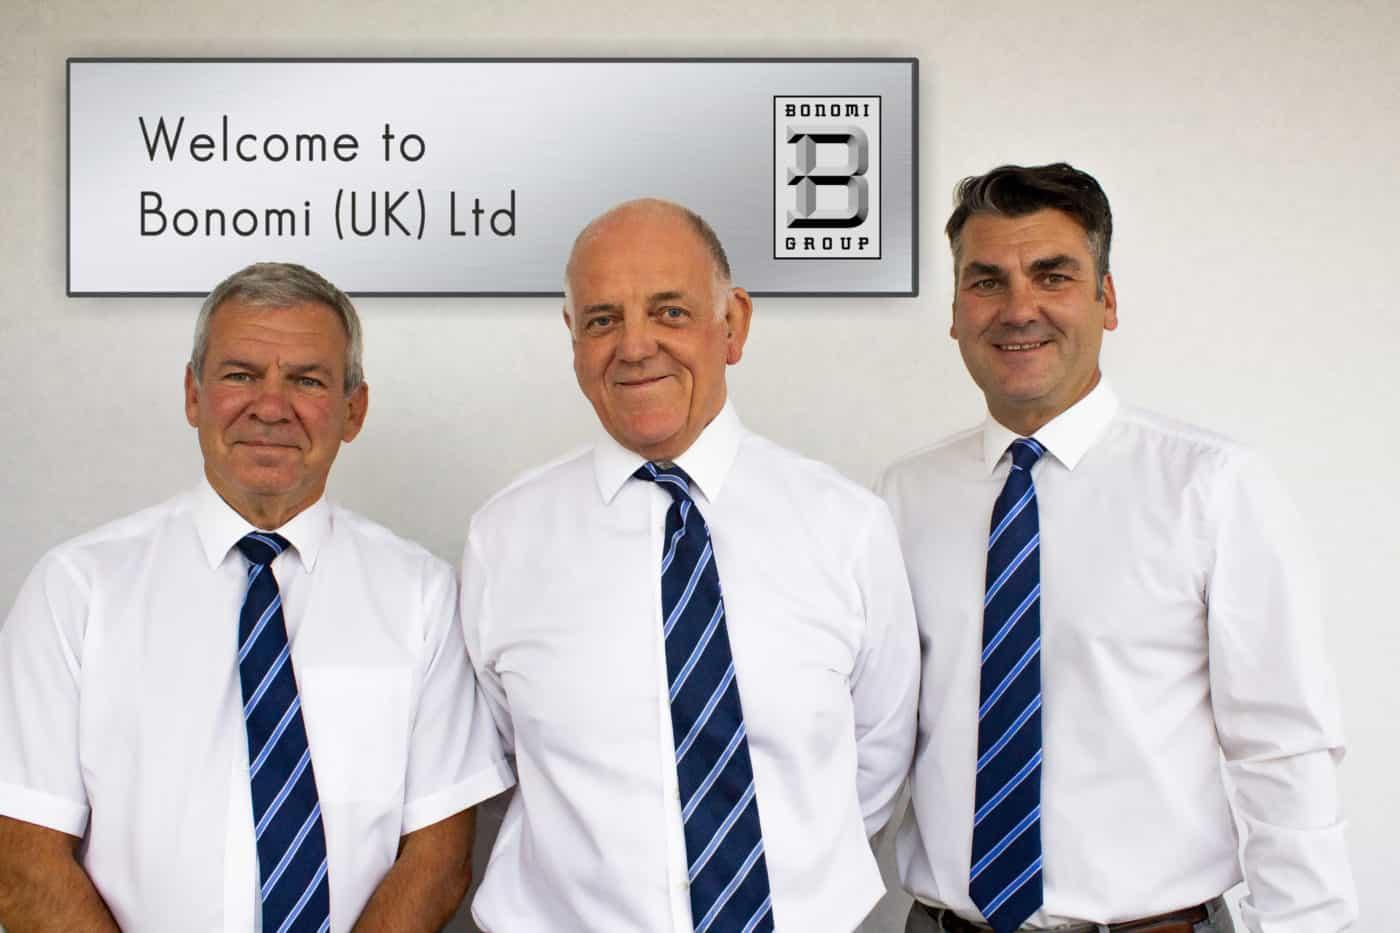 Bonomi UK Celebrates a Decade of Hydraulic Component Supply